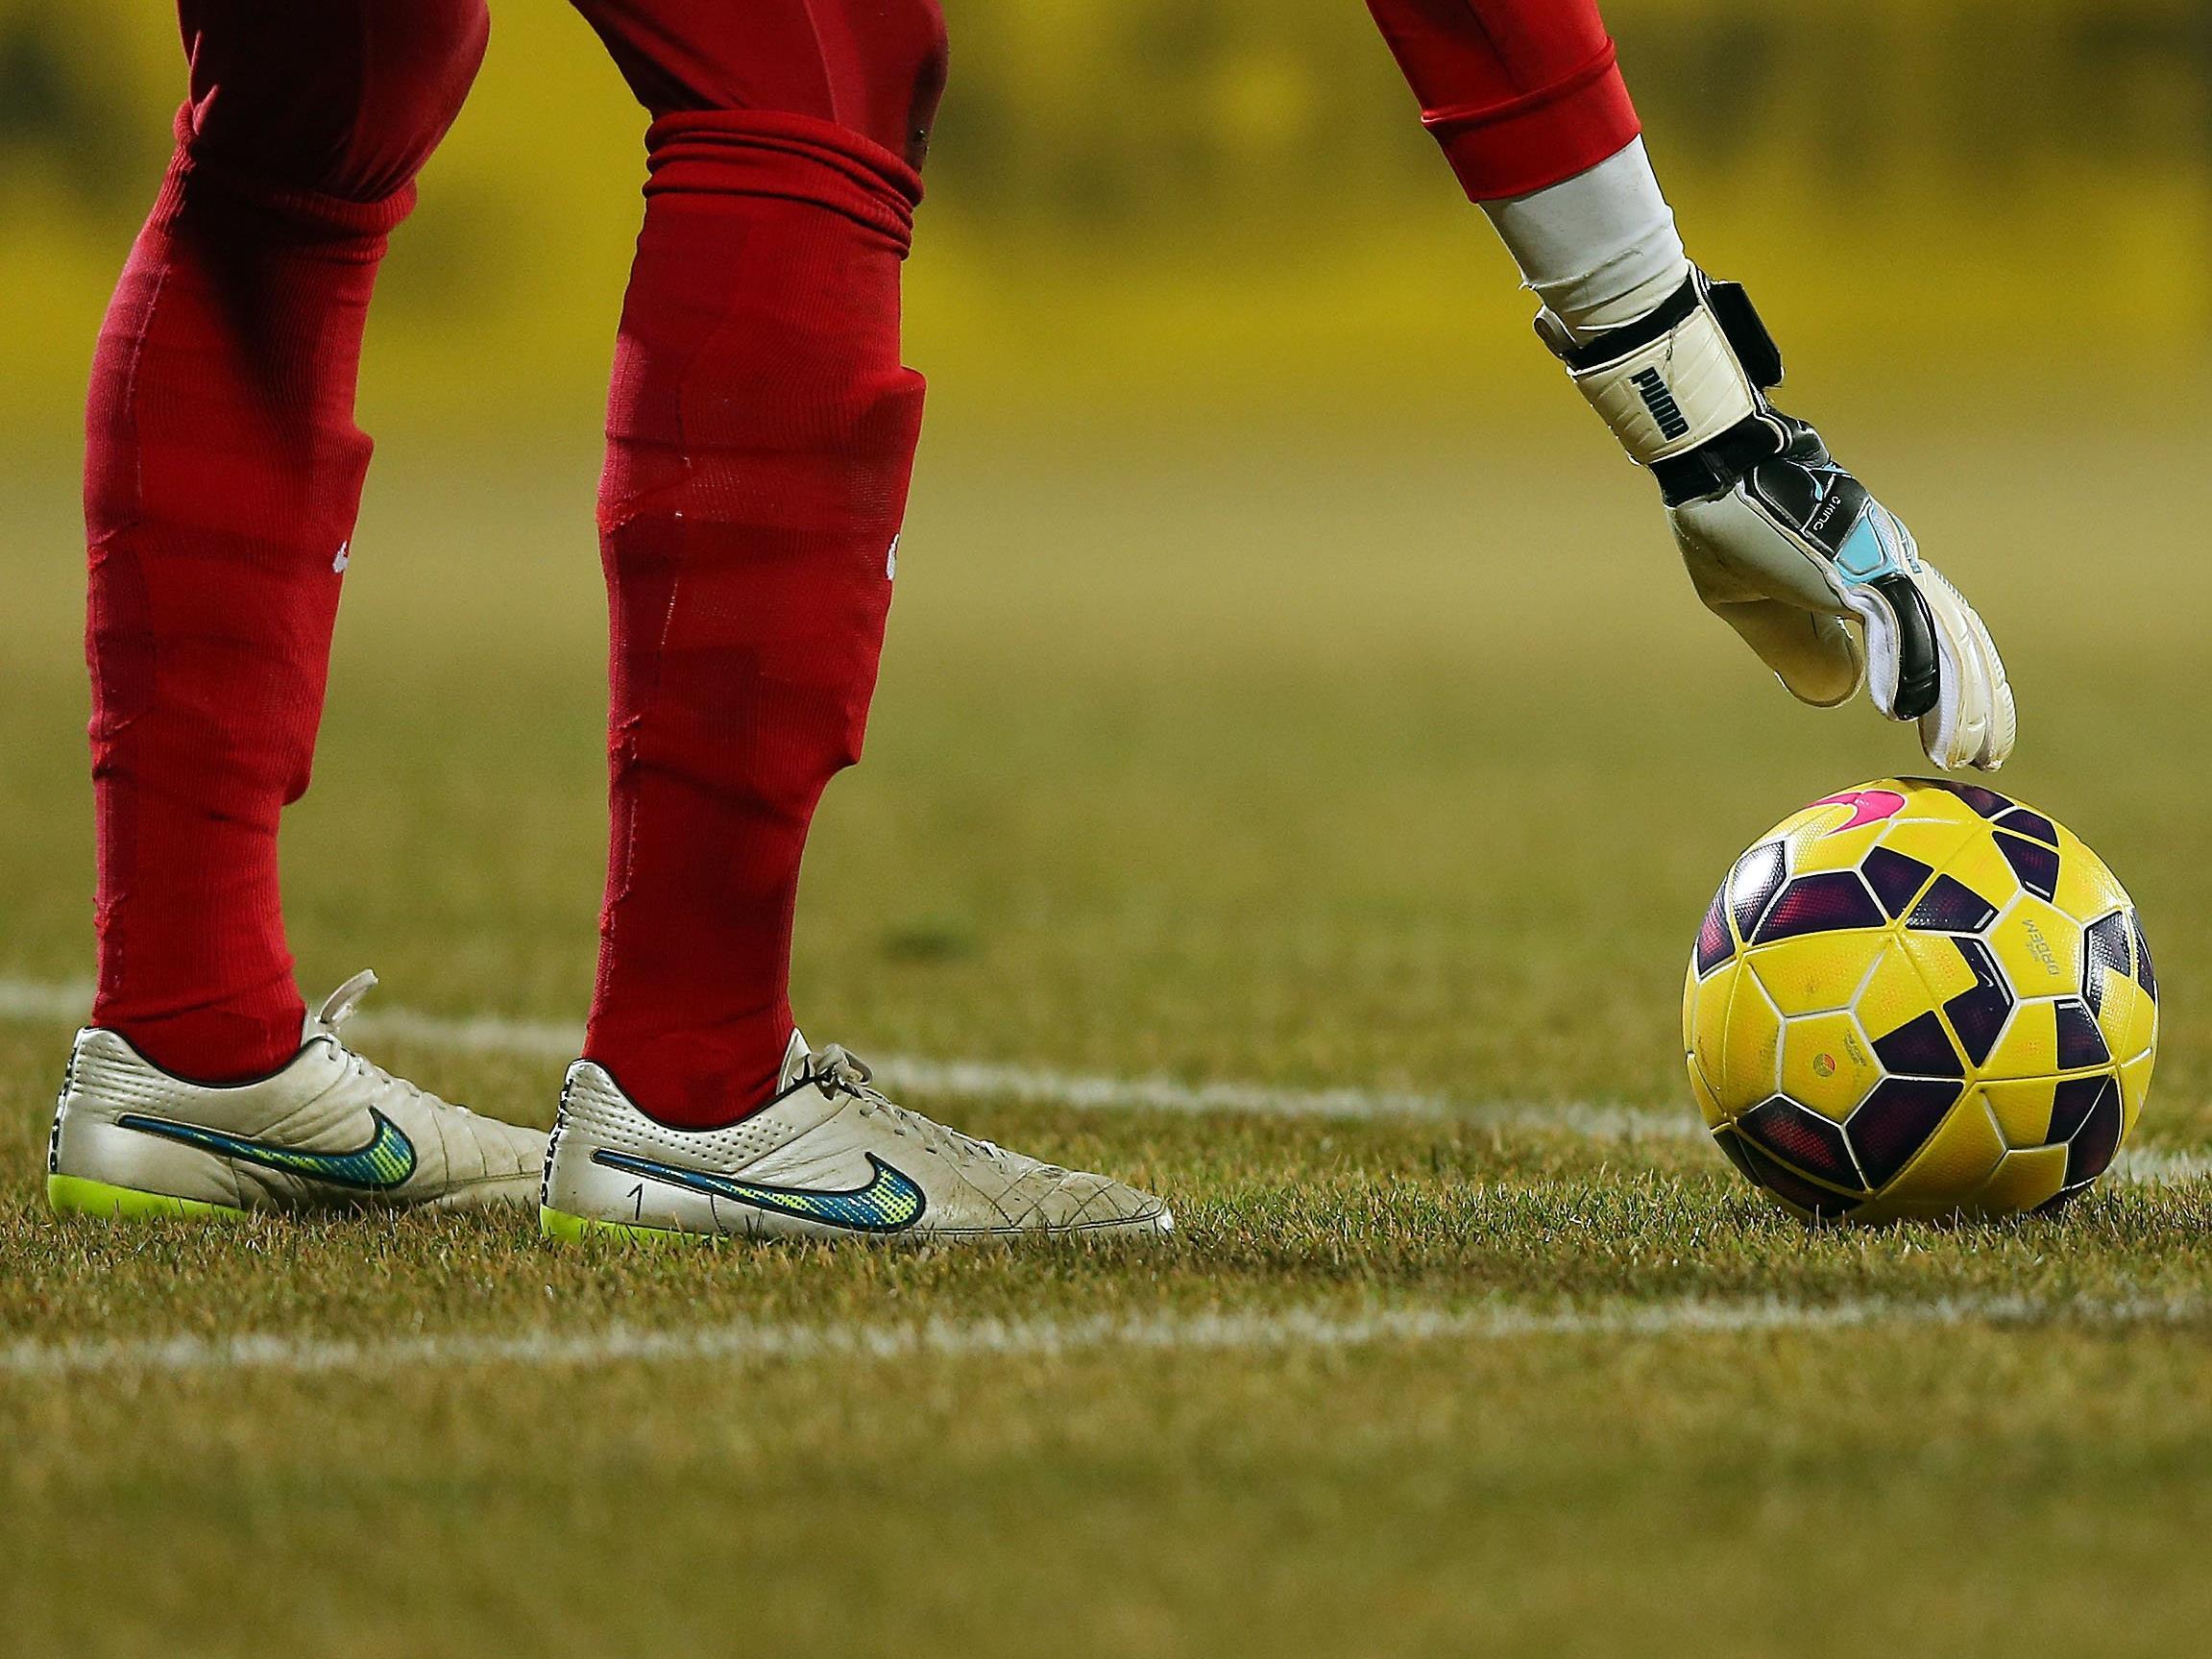 LIVE-Ticker zum Spiel Floridsdorfer AC gegen LASK Linz ab 20.30 Uhr.